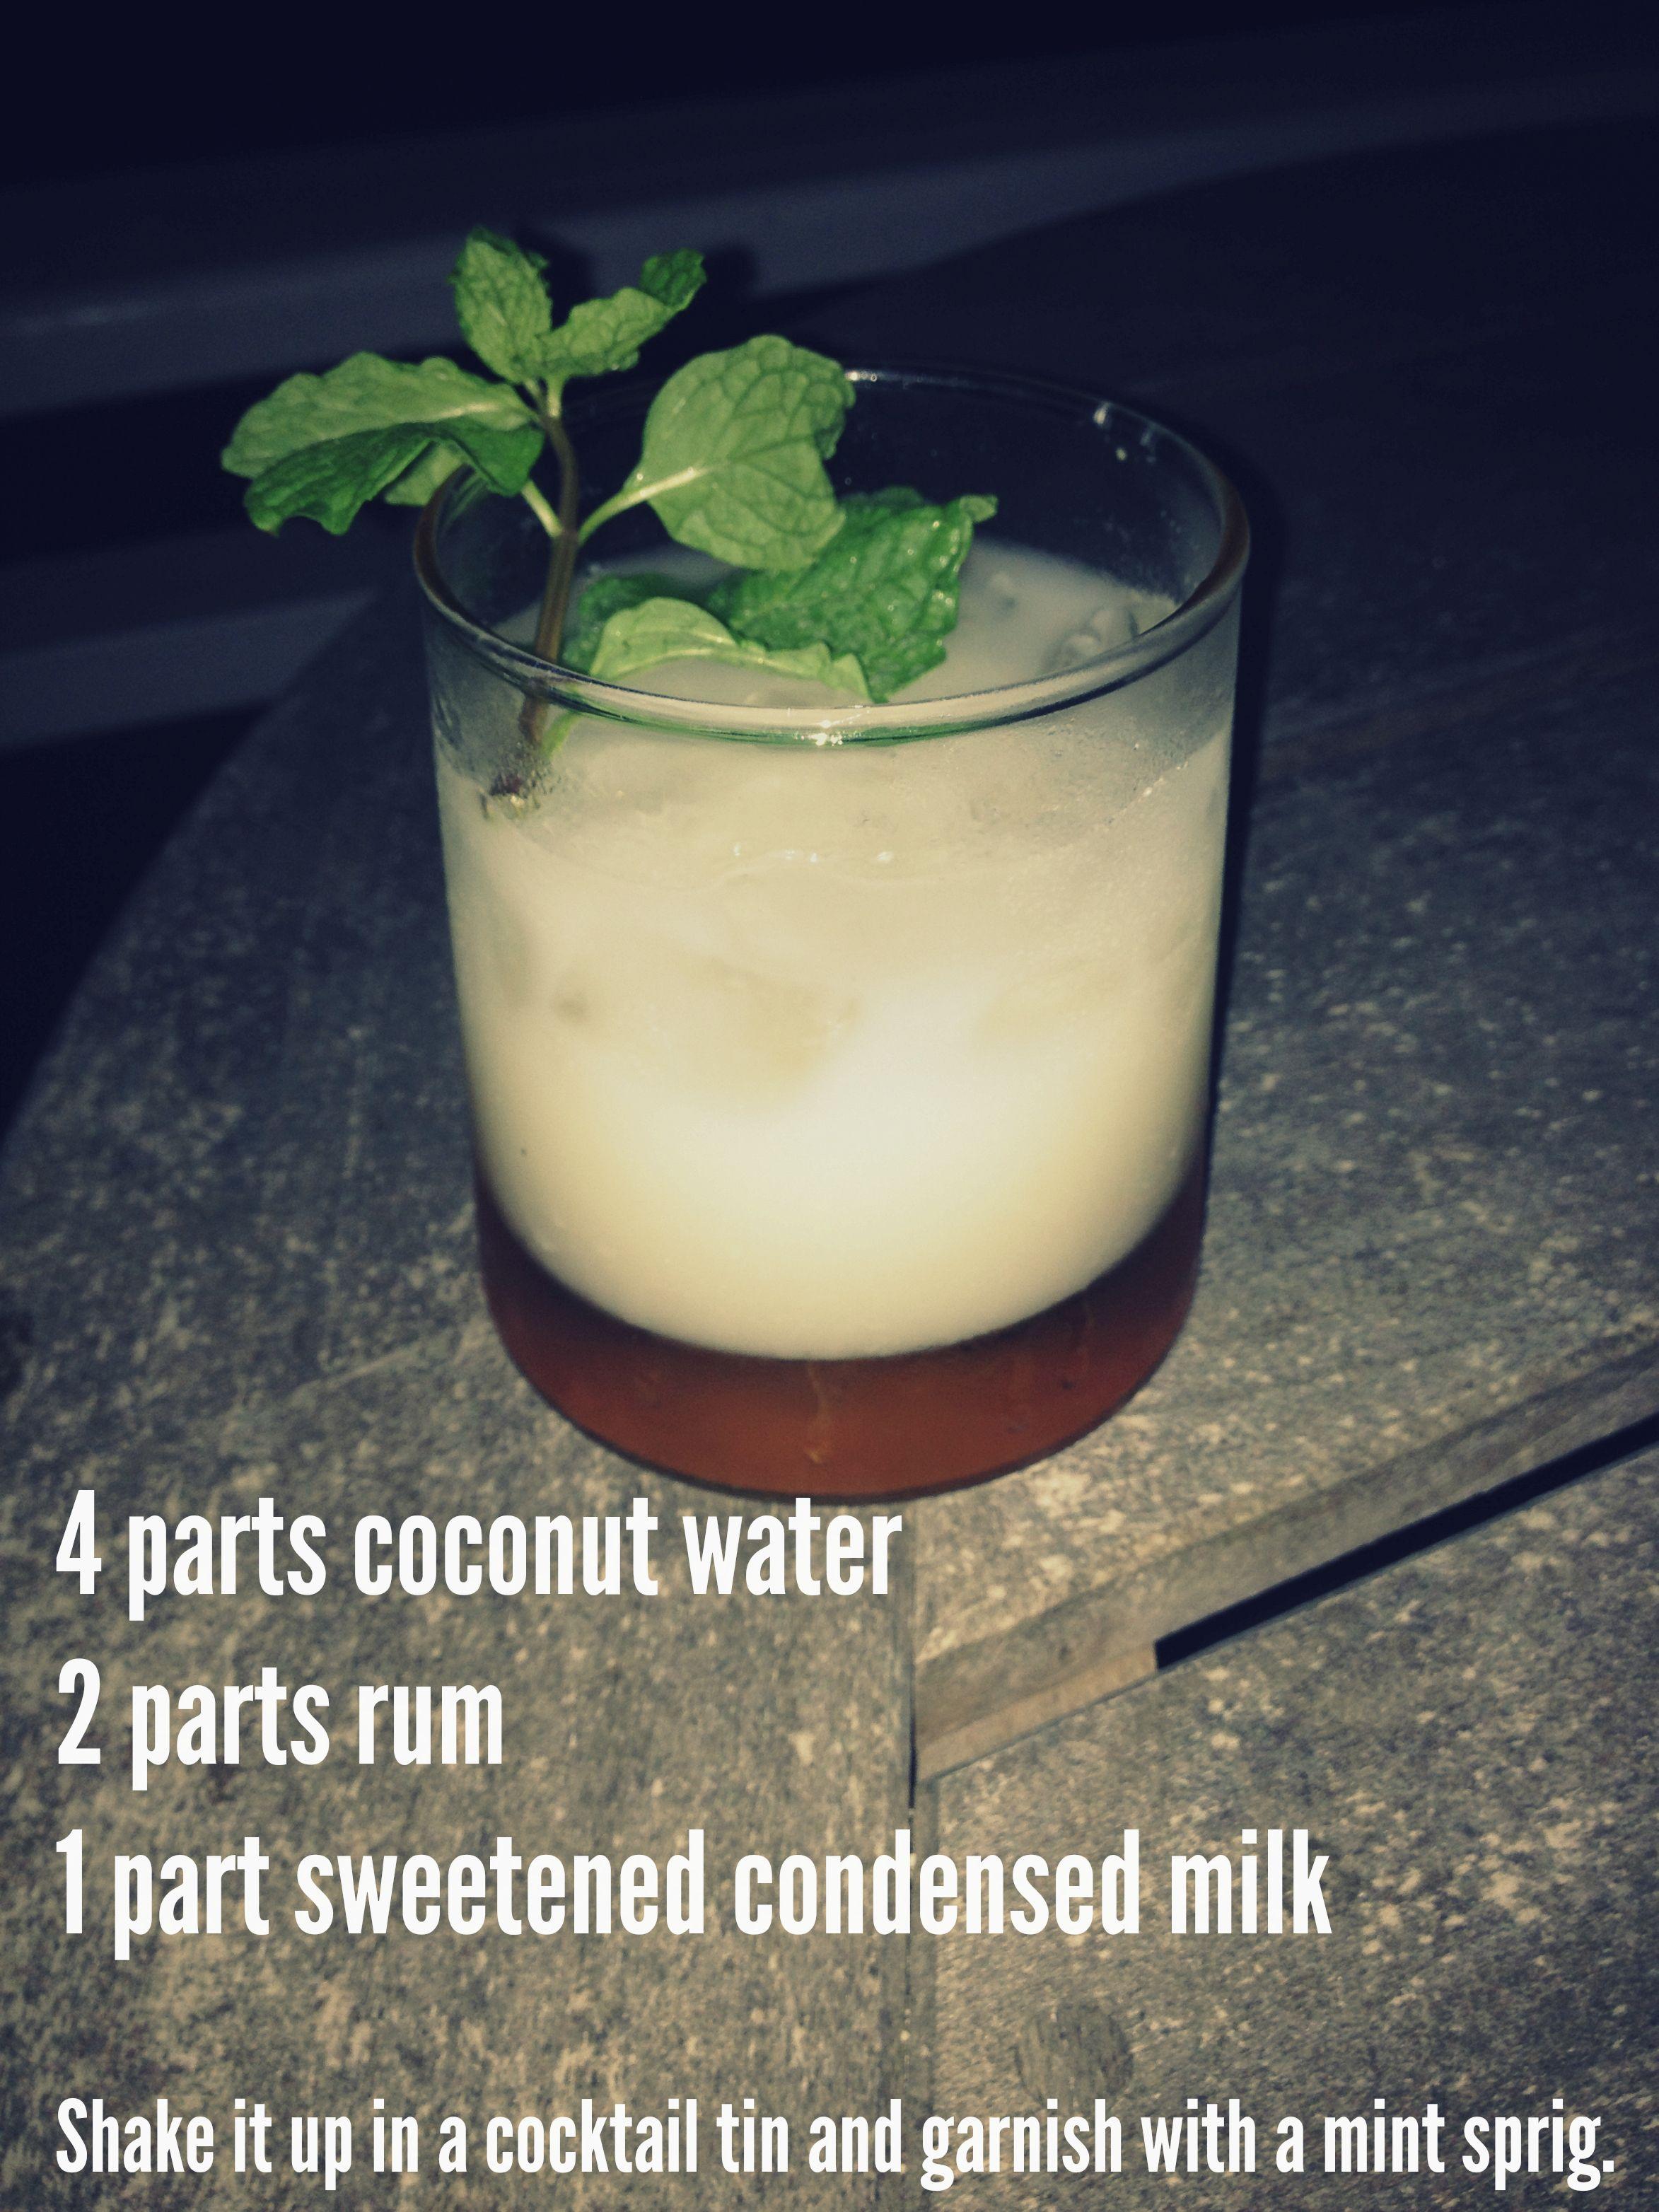 Sky Juice Is A Simple Mixture Of Coconut Water Sweetened Condensed Milk And Rum Bahamian Food Fancy Drinks Tropical Drink